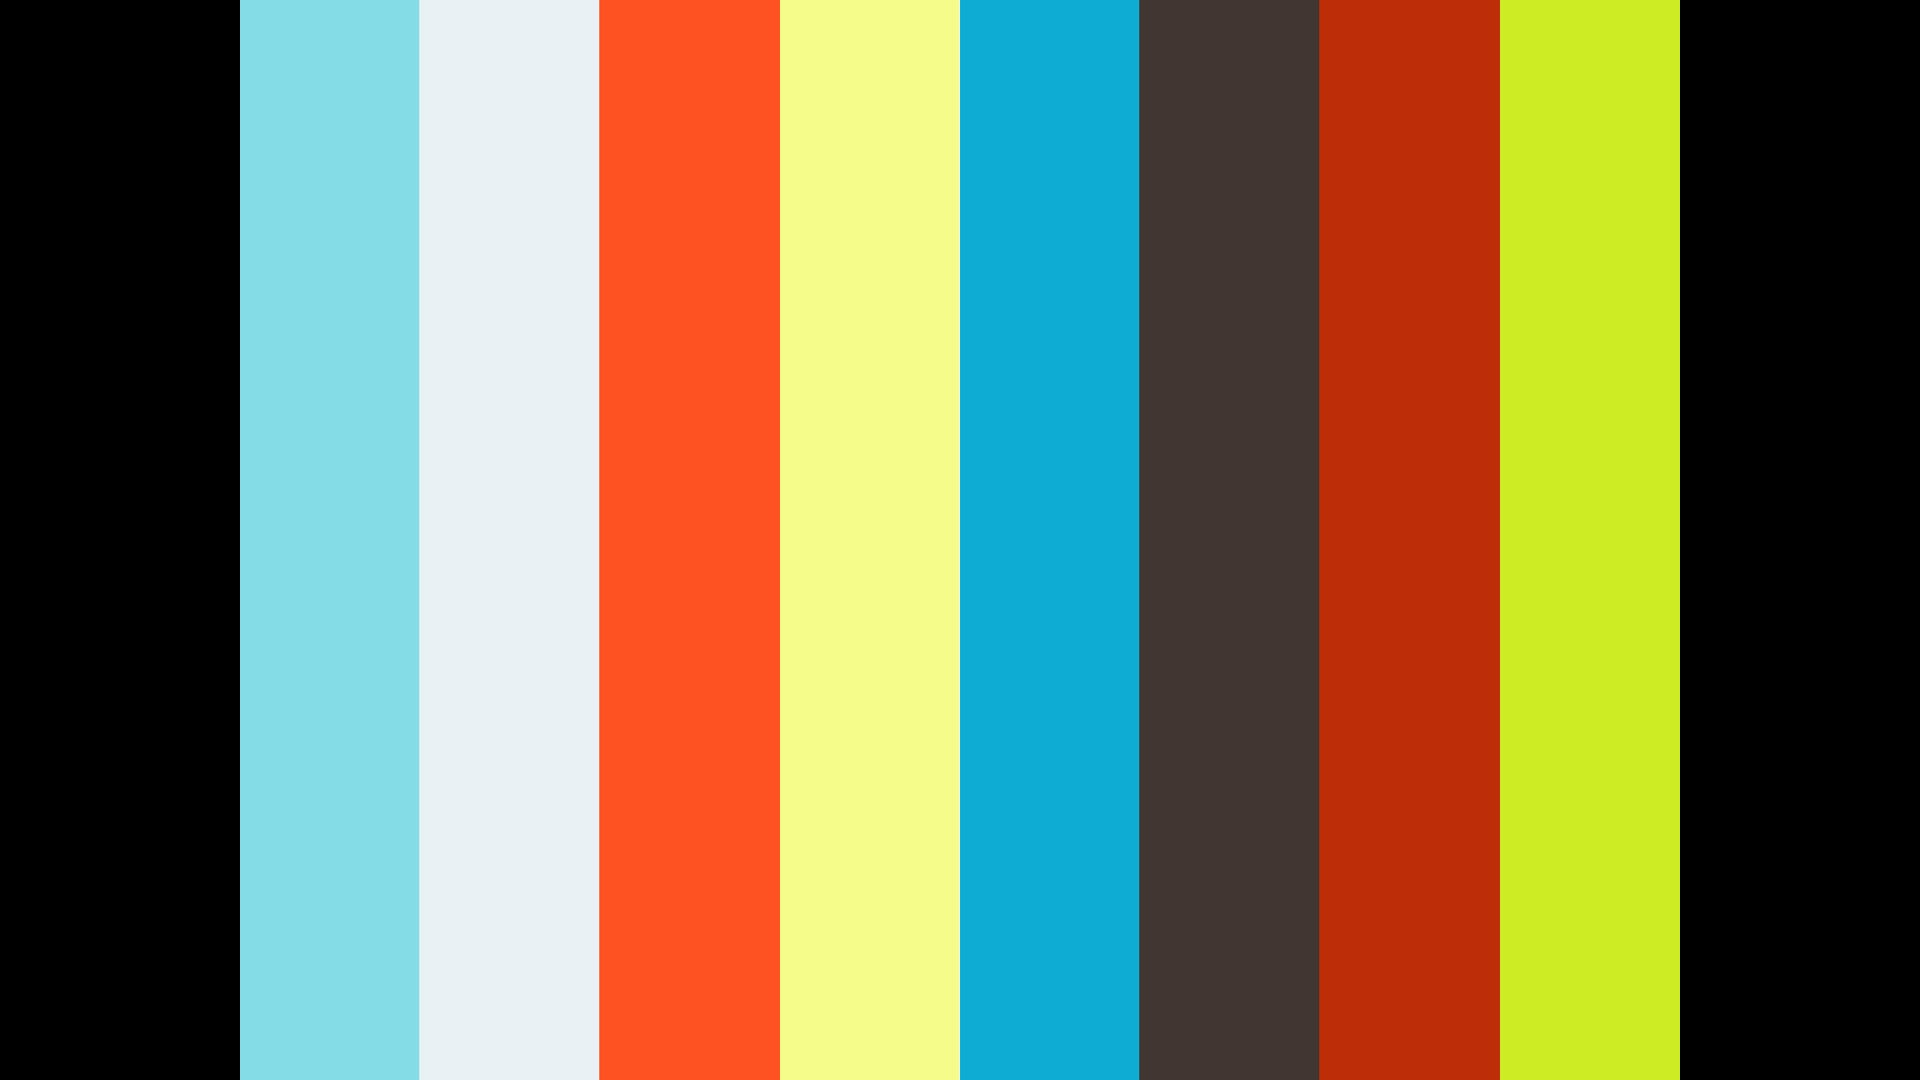 2020-05-21 ILOT TIAMBOUEN - SKYVIEW